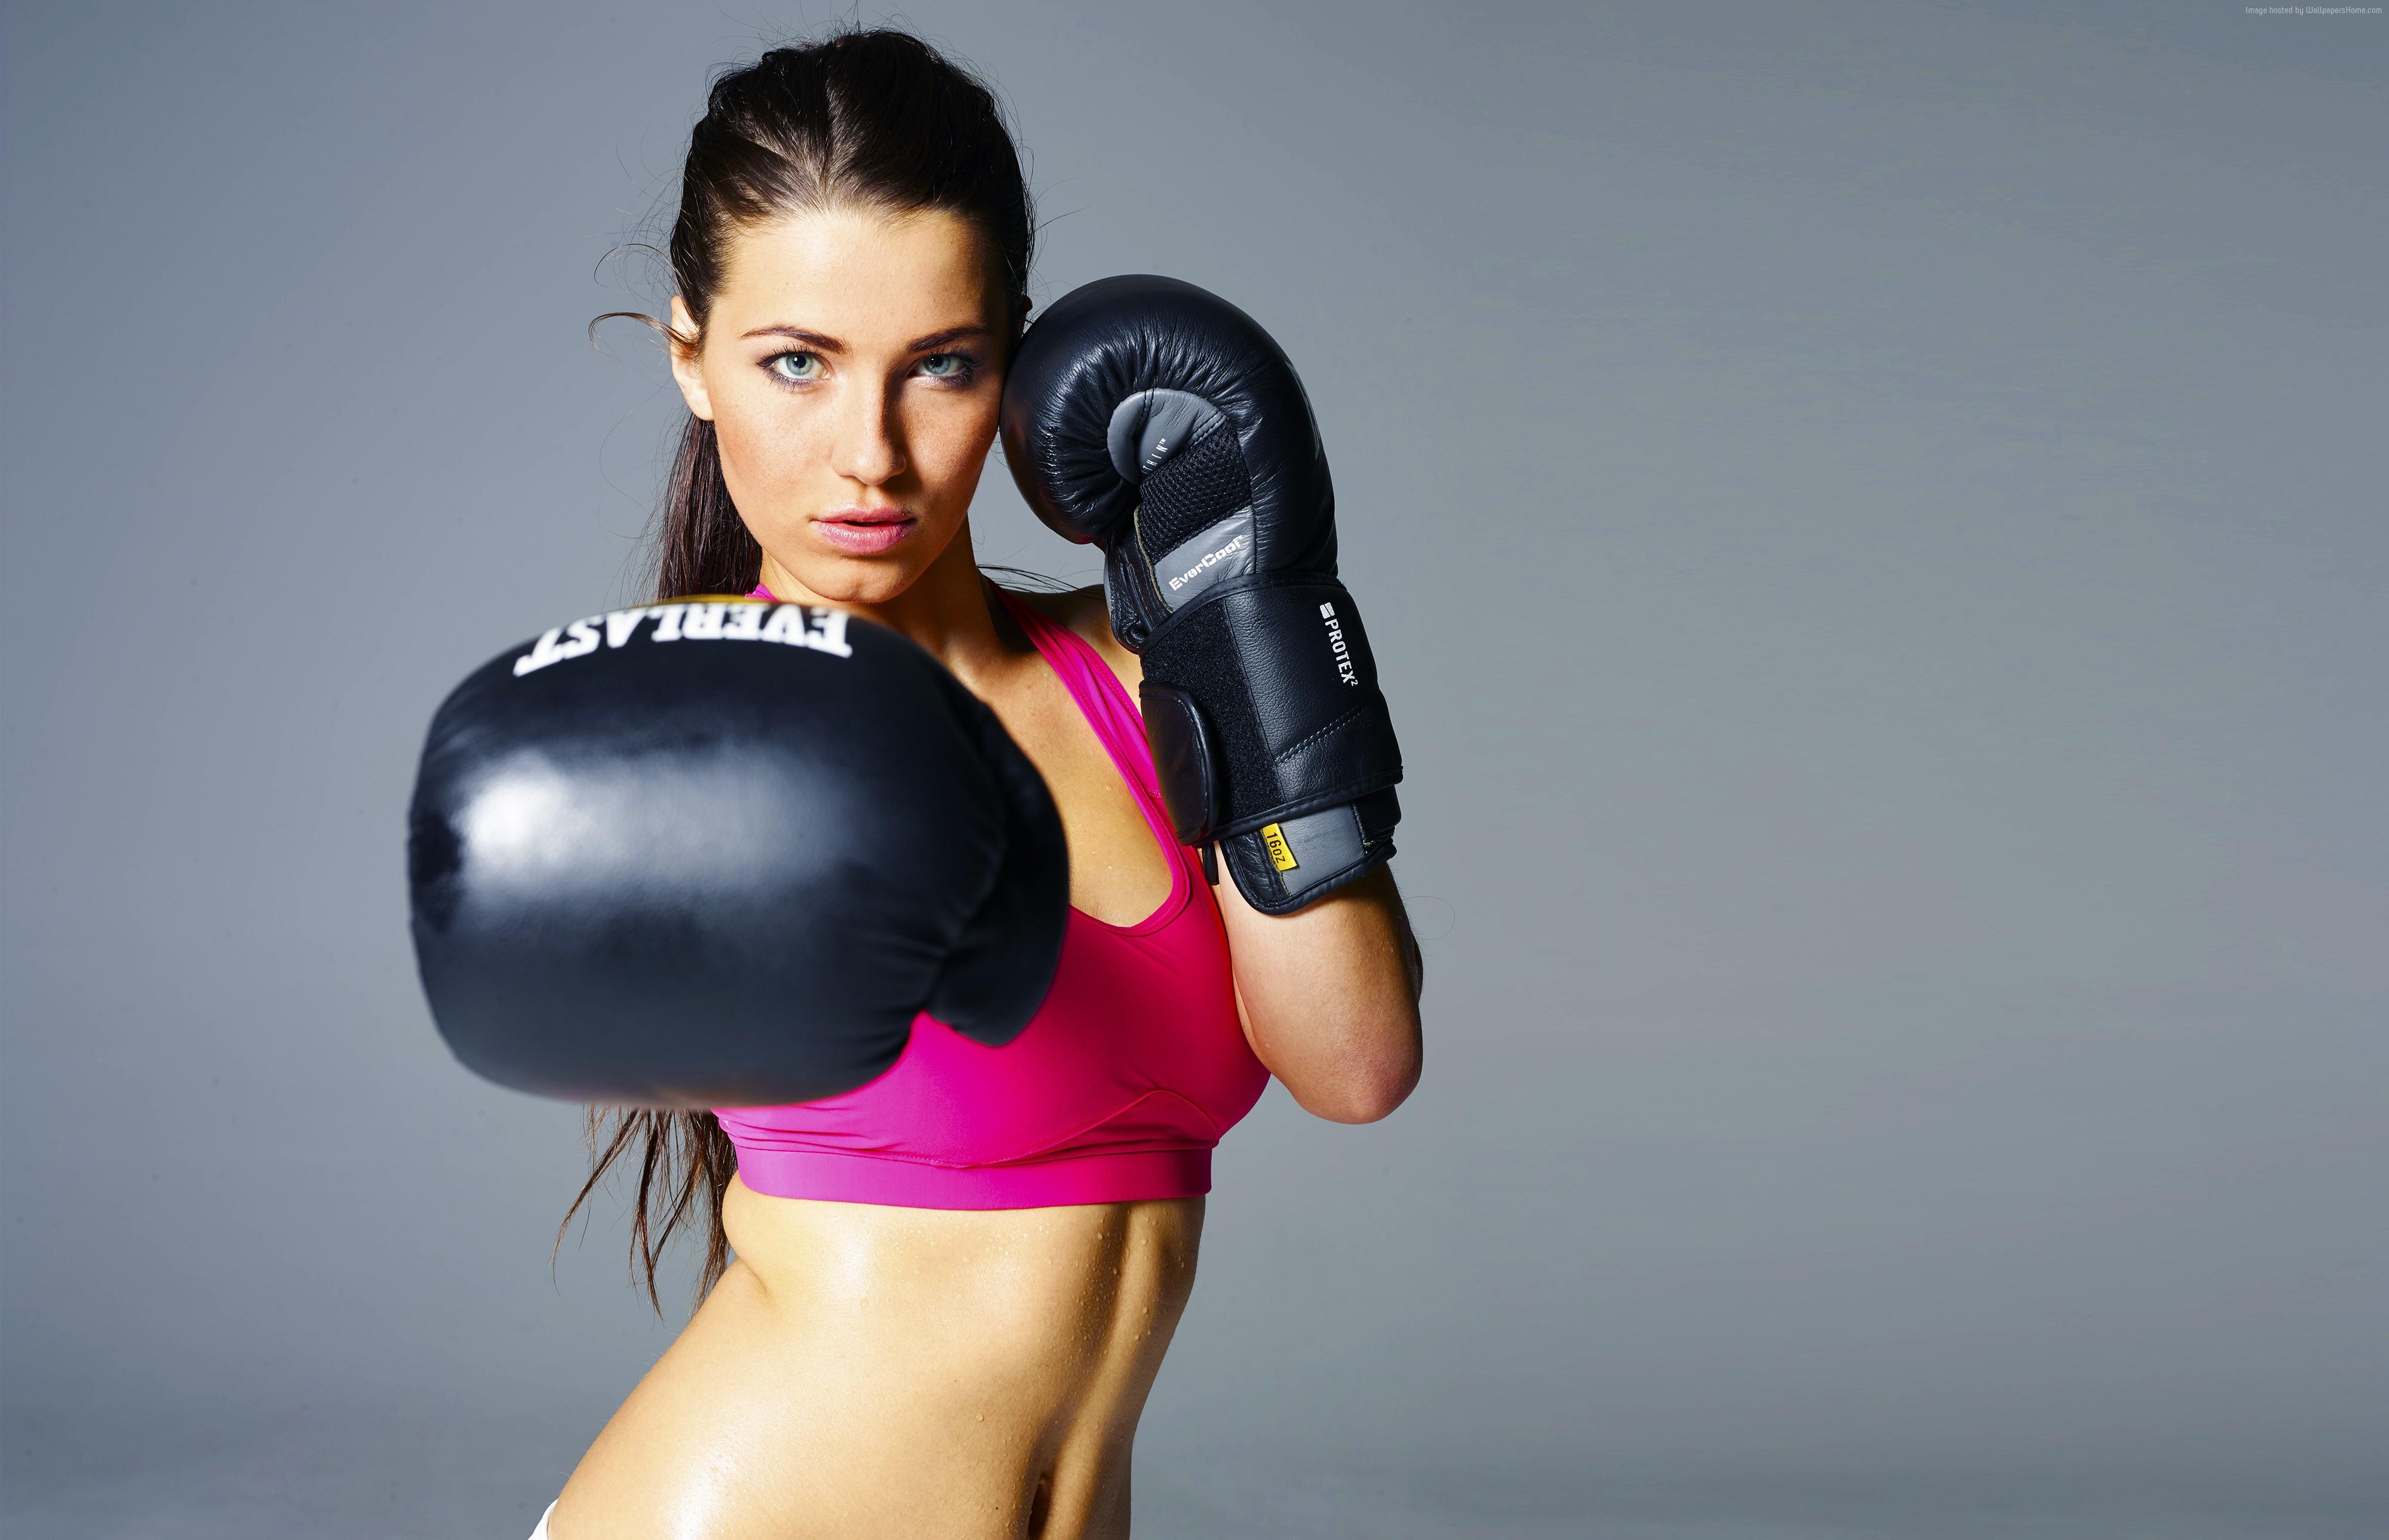 Sport girl photo